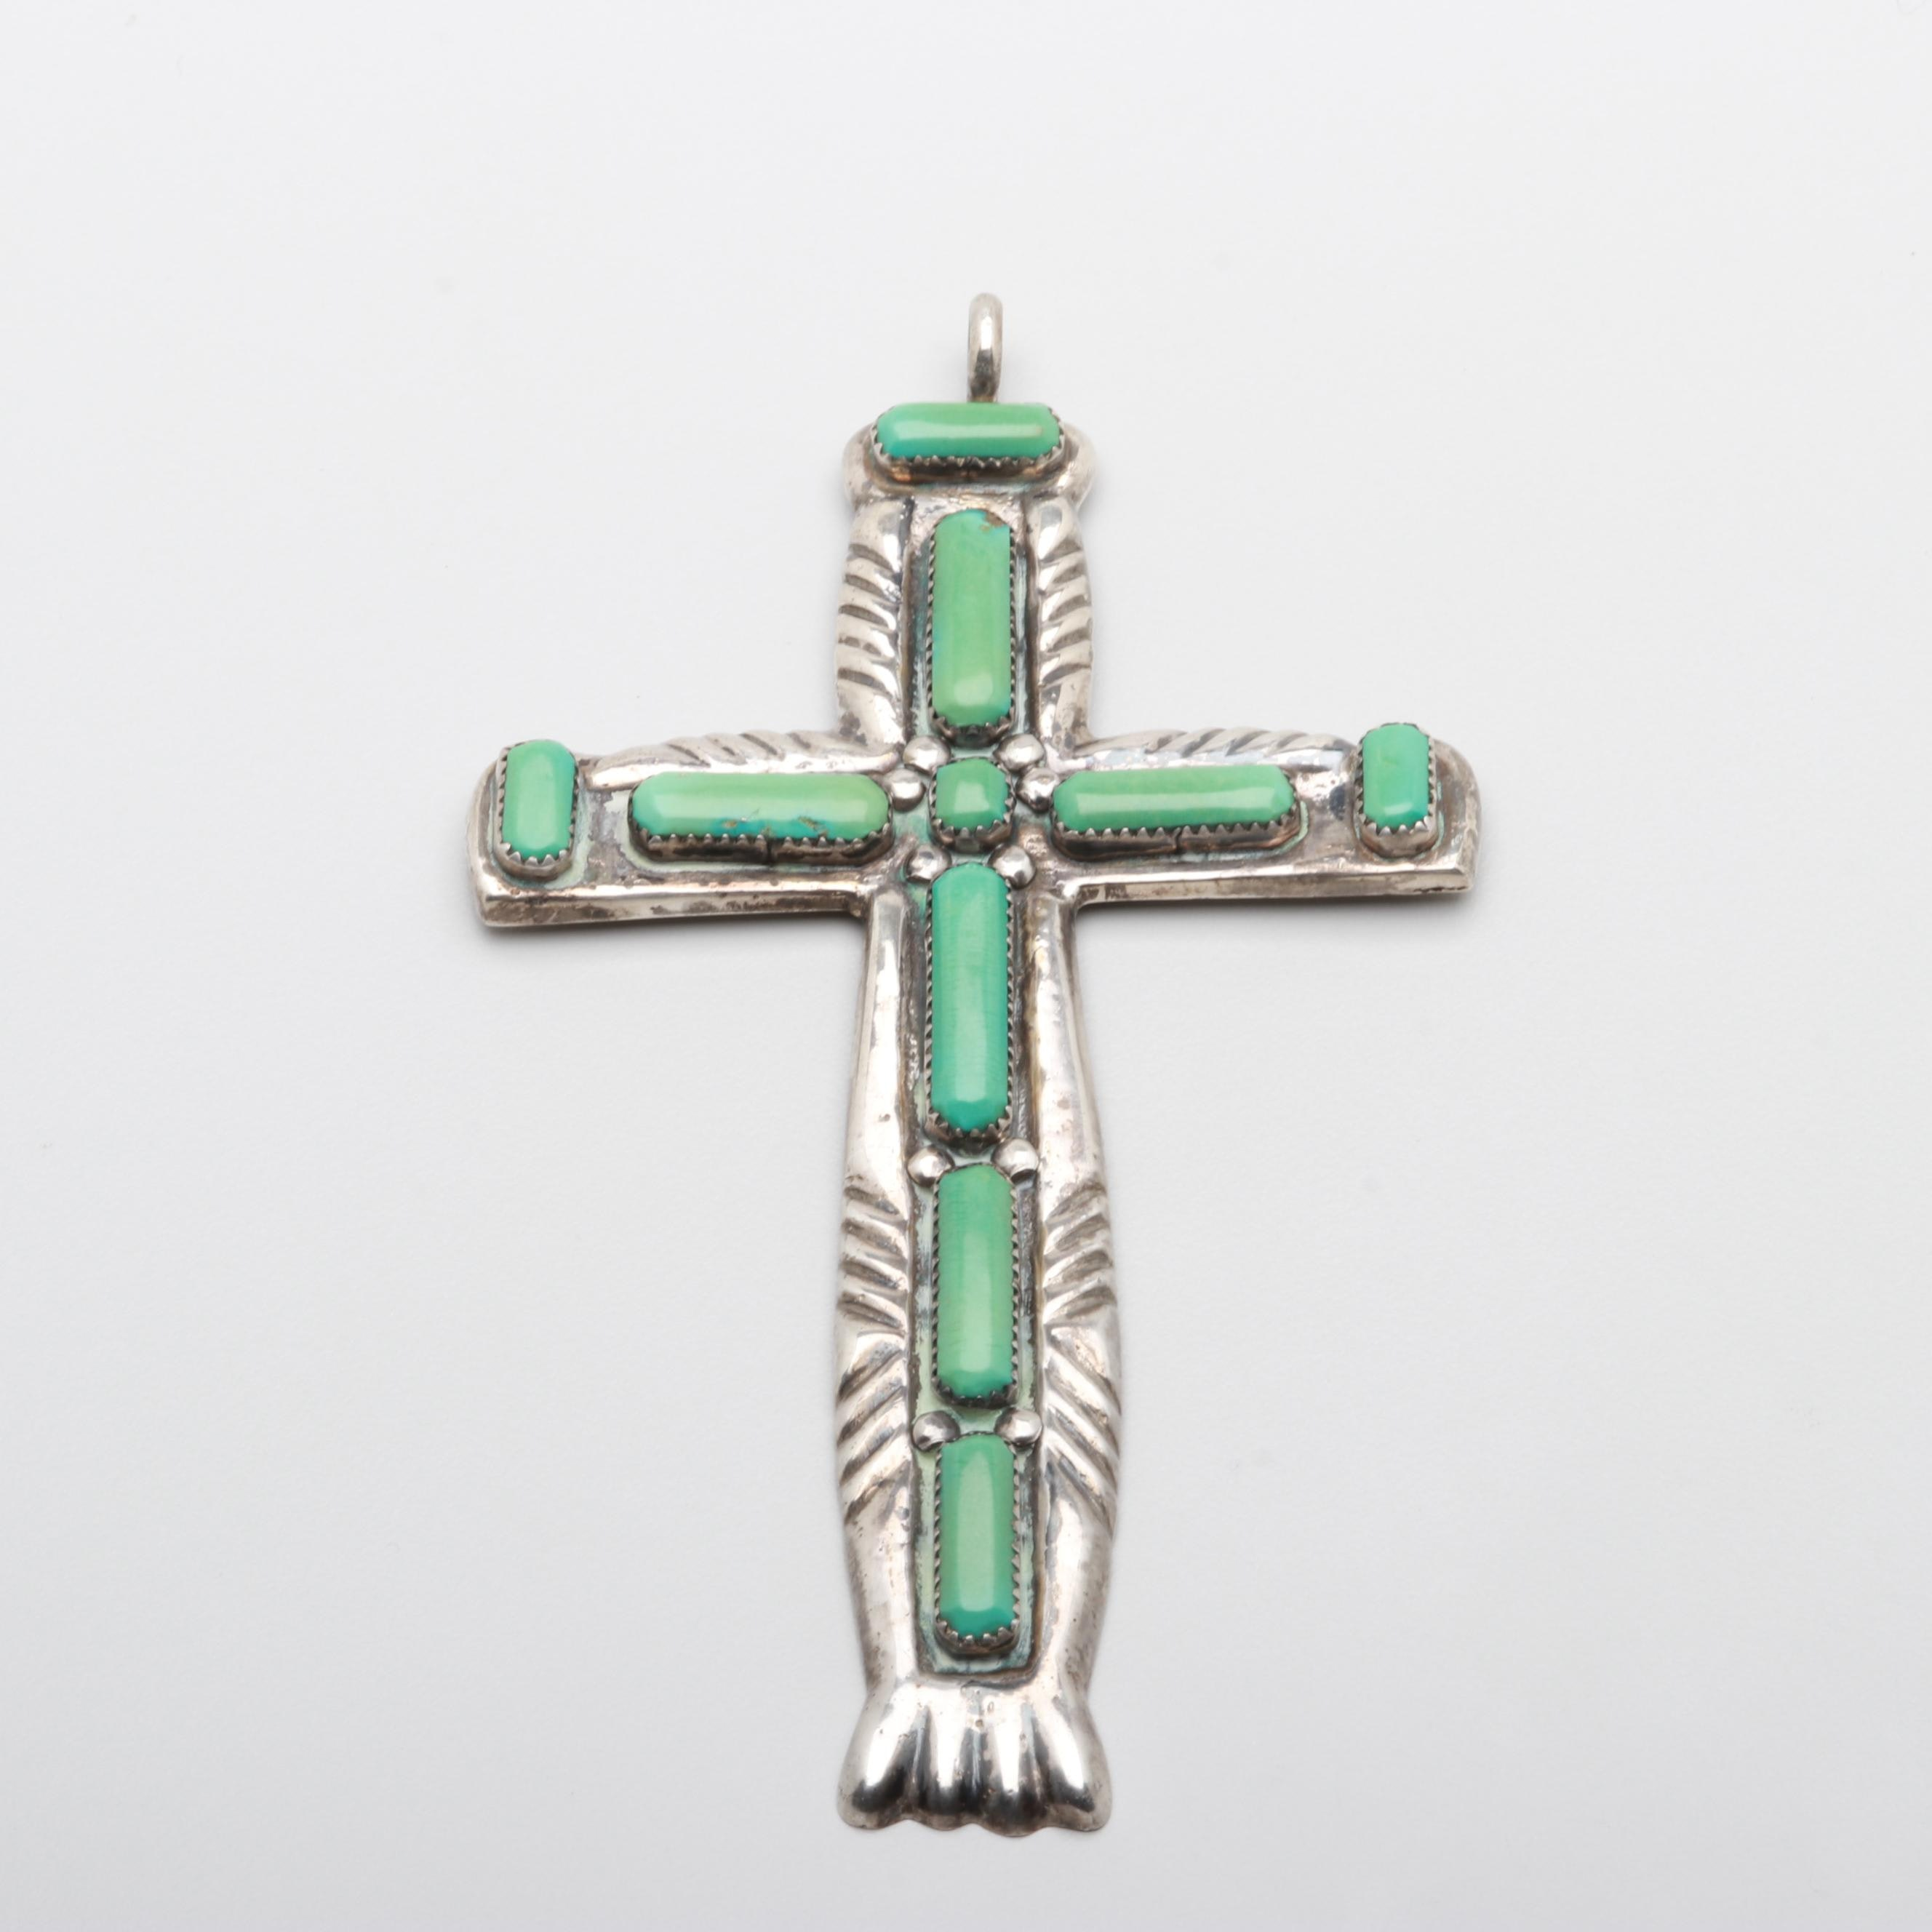 Wilbur Iule Zuni Sterling Silver Stabilized Turquoise Cross Pendant